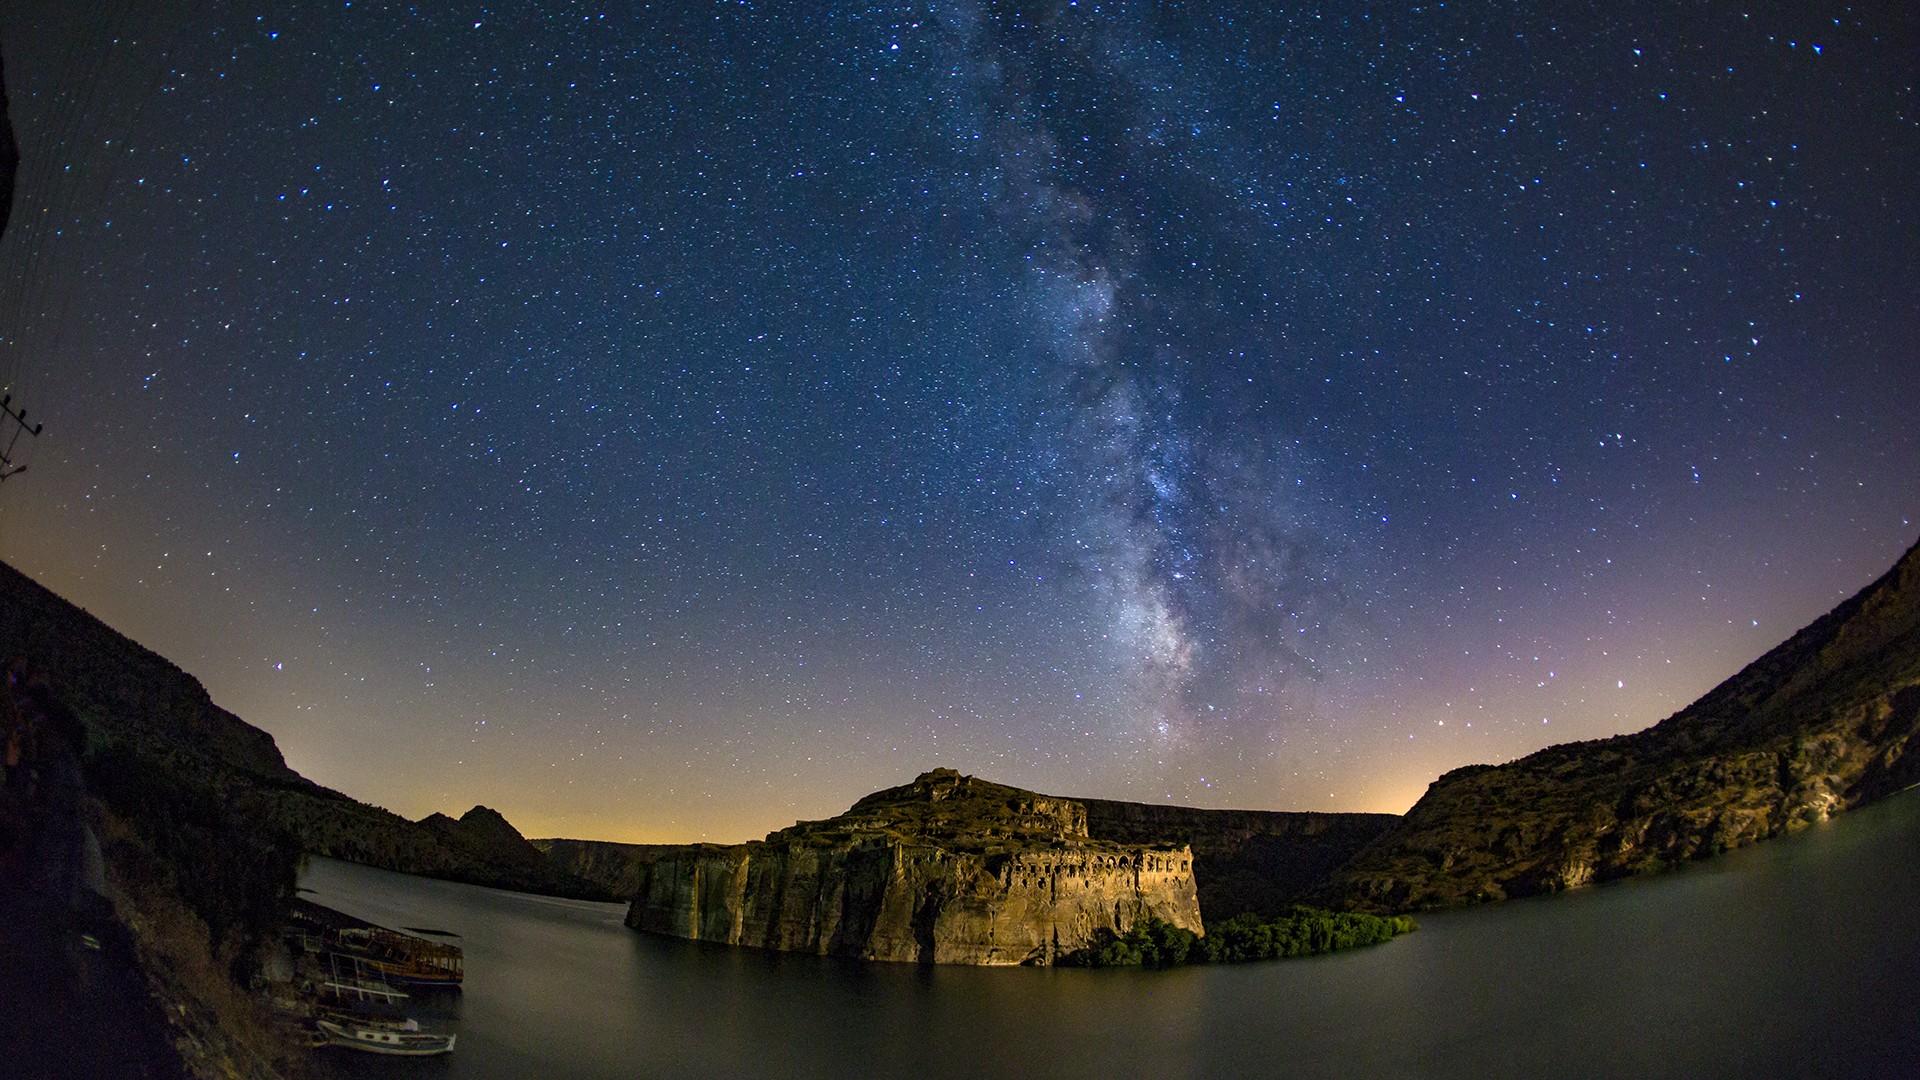 Wallpaper Landscape Night Galaxy Water Nature Reflection Sky